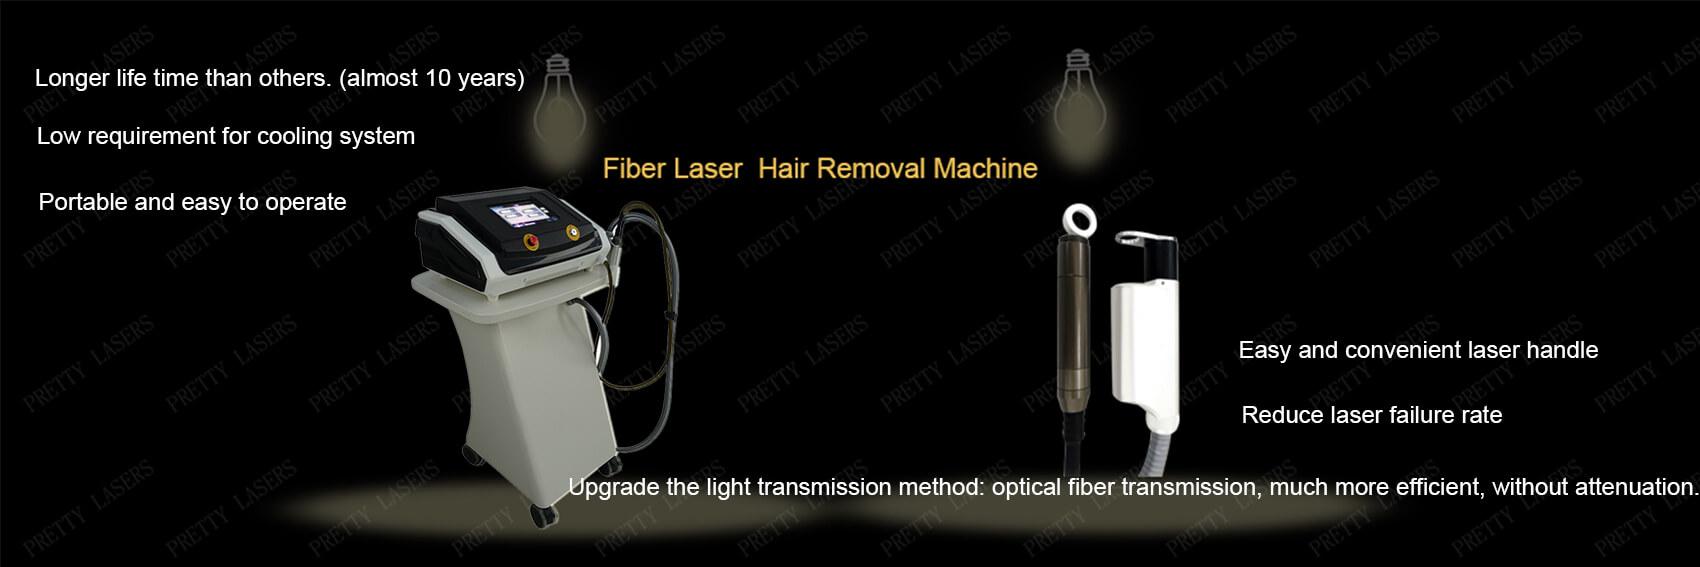 Fiber Laser Hair Removal Machine Advantage